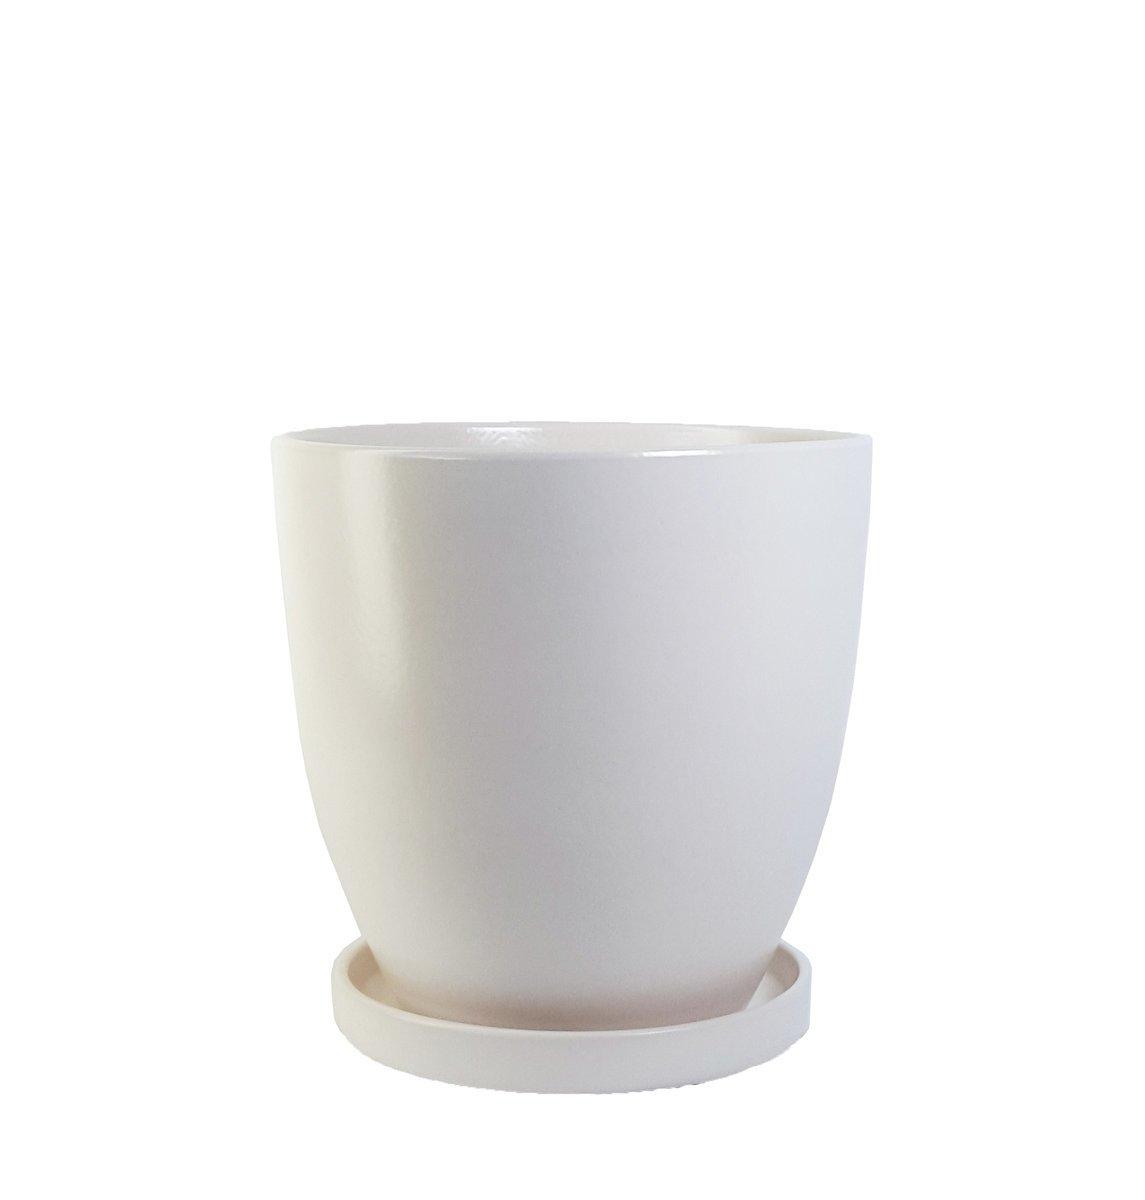 White Ceramic Plant Pot With Saucer Xl